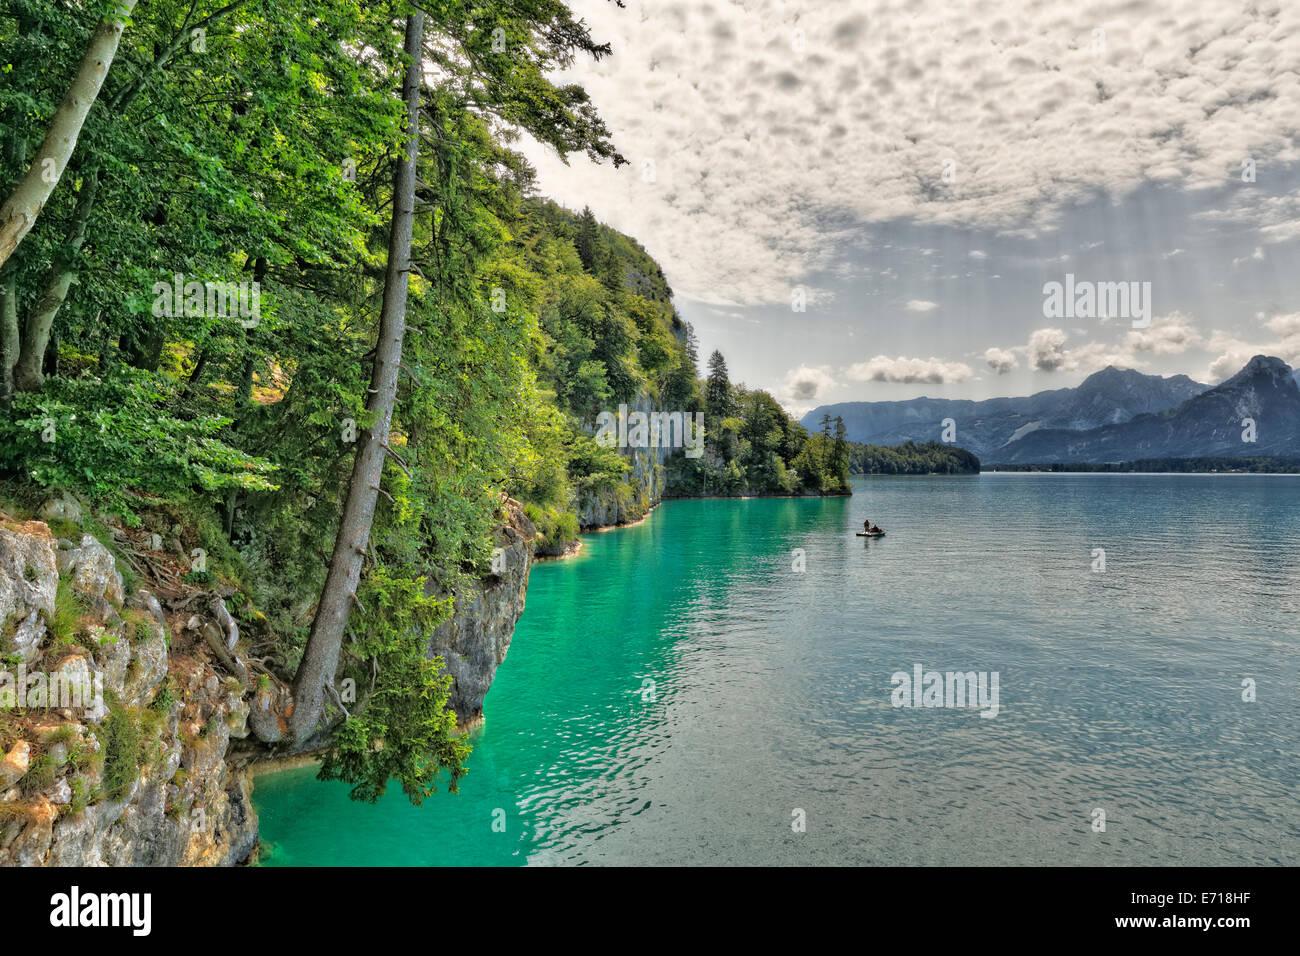 Austria, Salzkammergut, Salzburg State, Sankt Gilgen, View to Wolfgangsee Lake - Stock Image